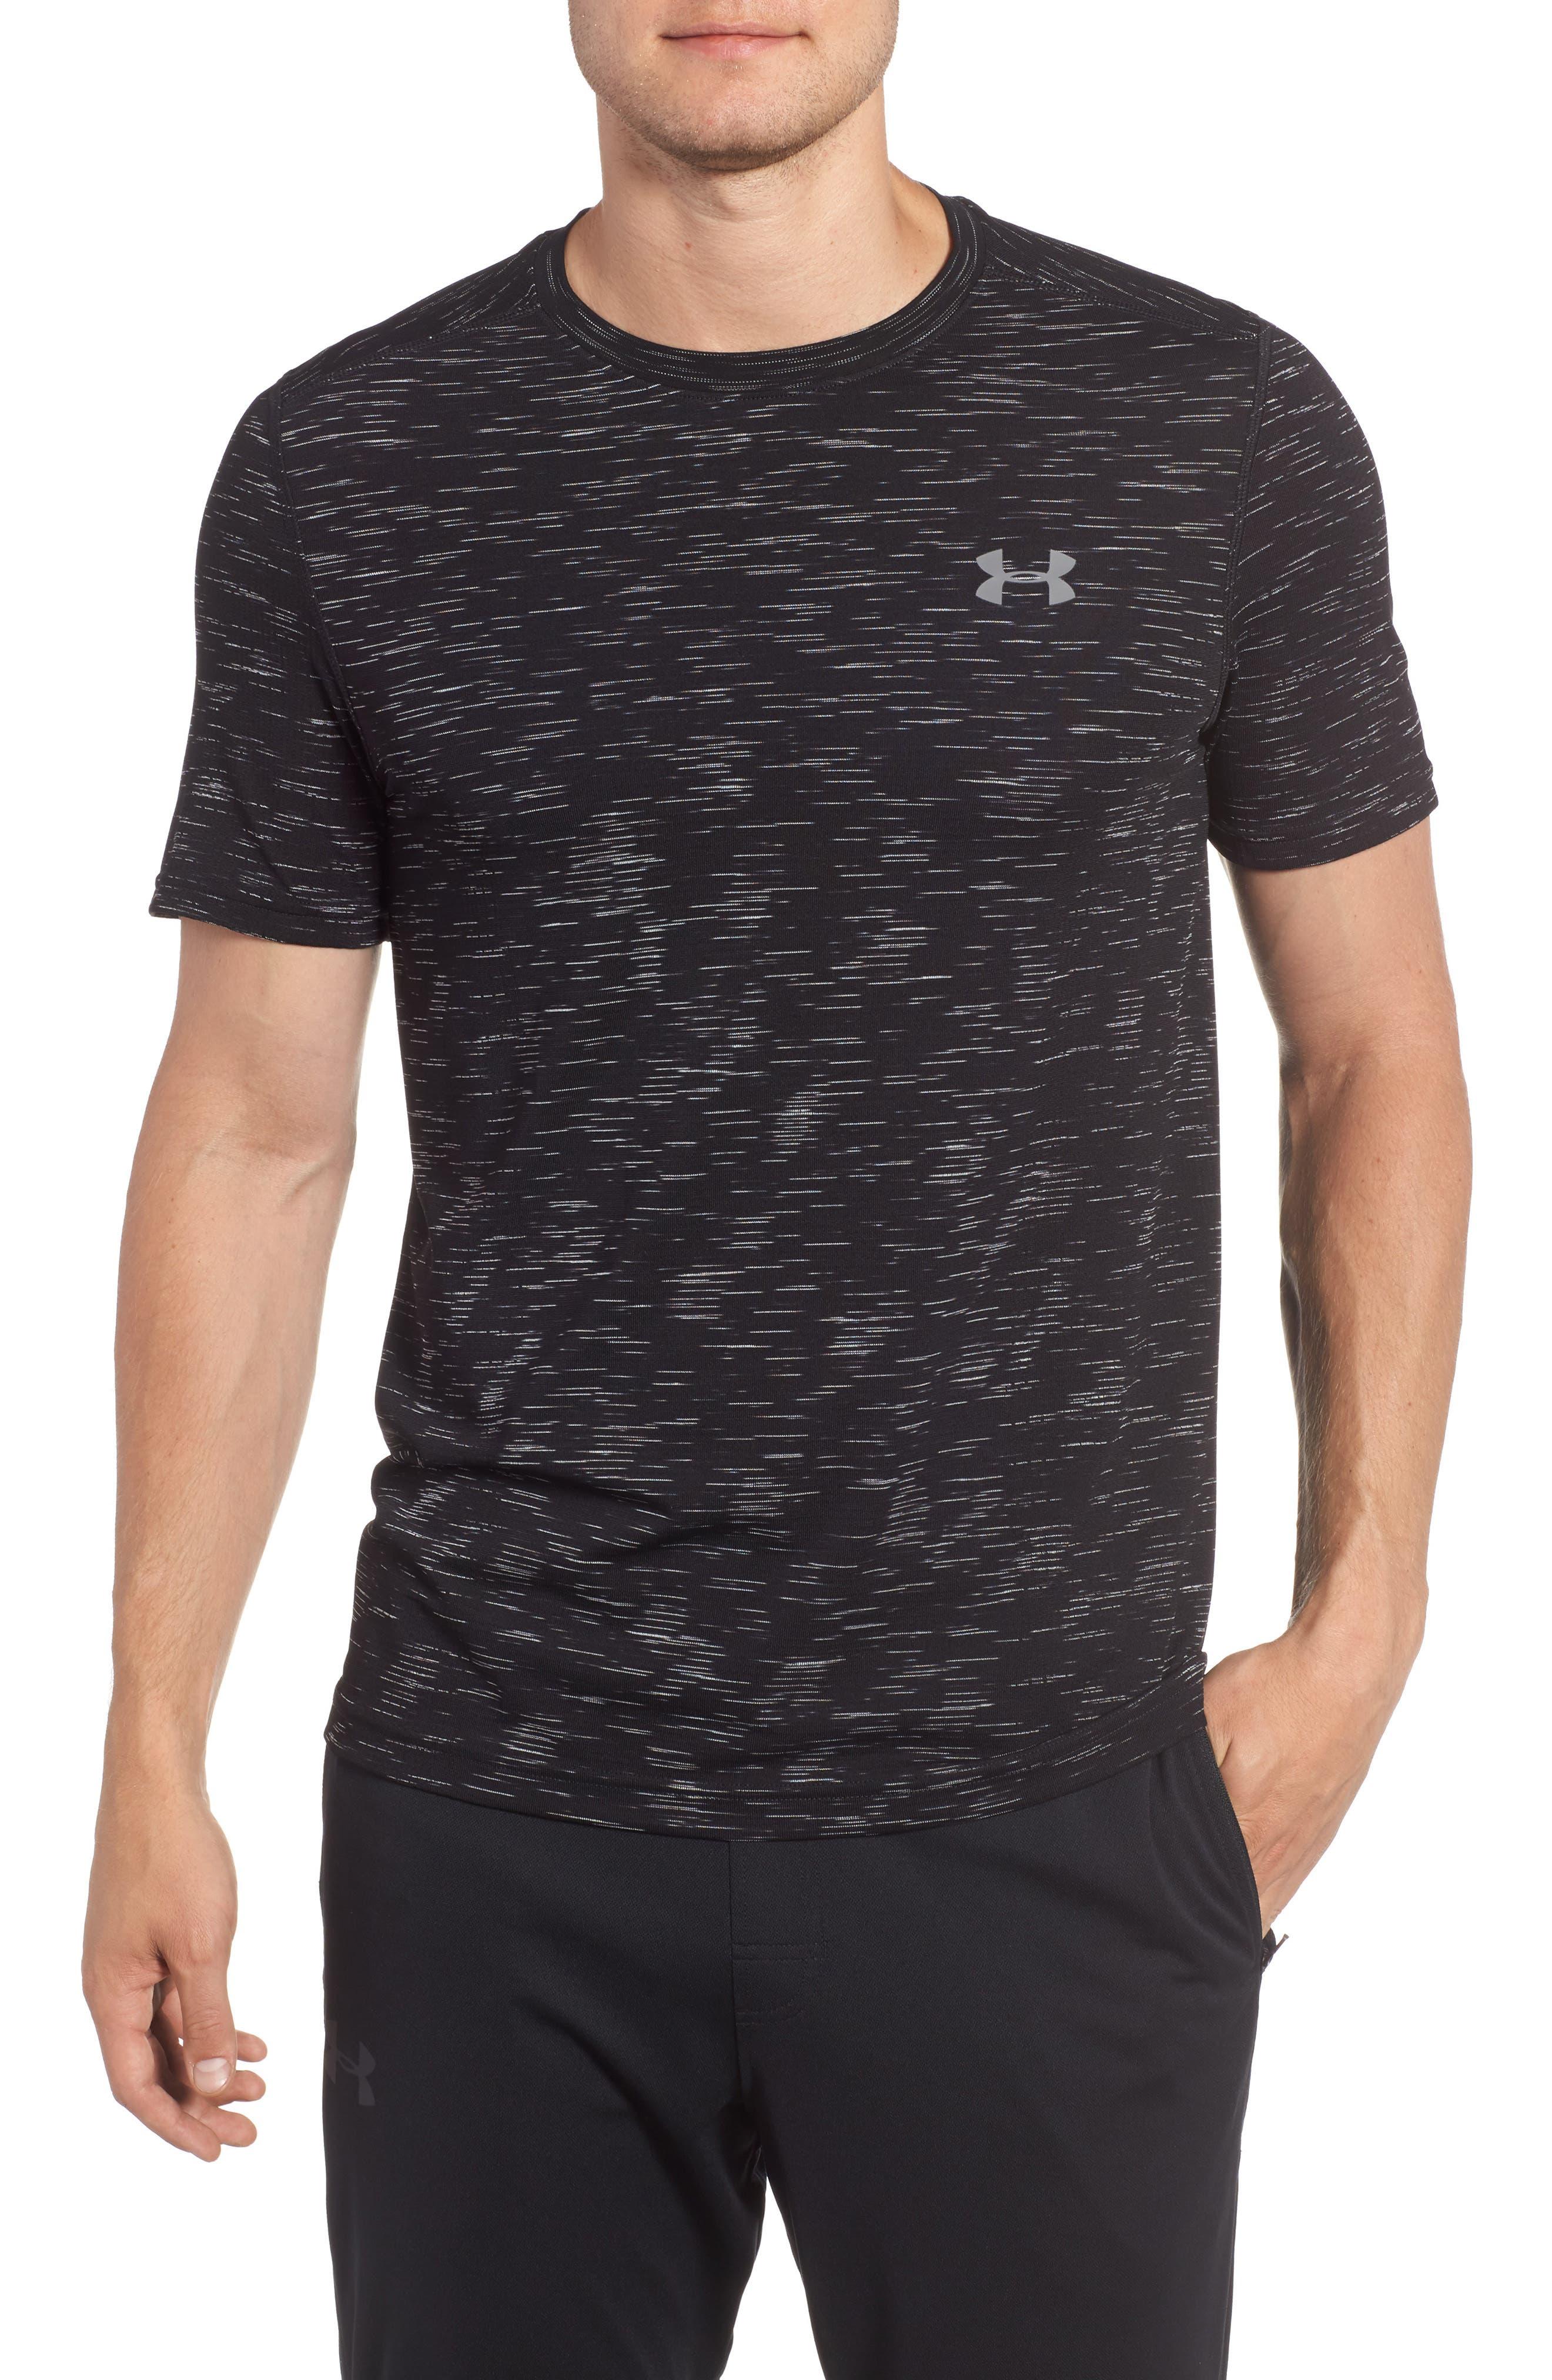 Threadborne Regular Fit T-Shirt,                         Main,                         color, Black / Graphite